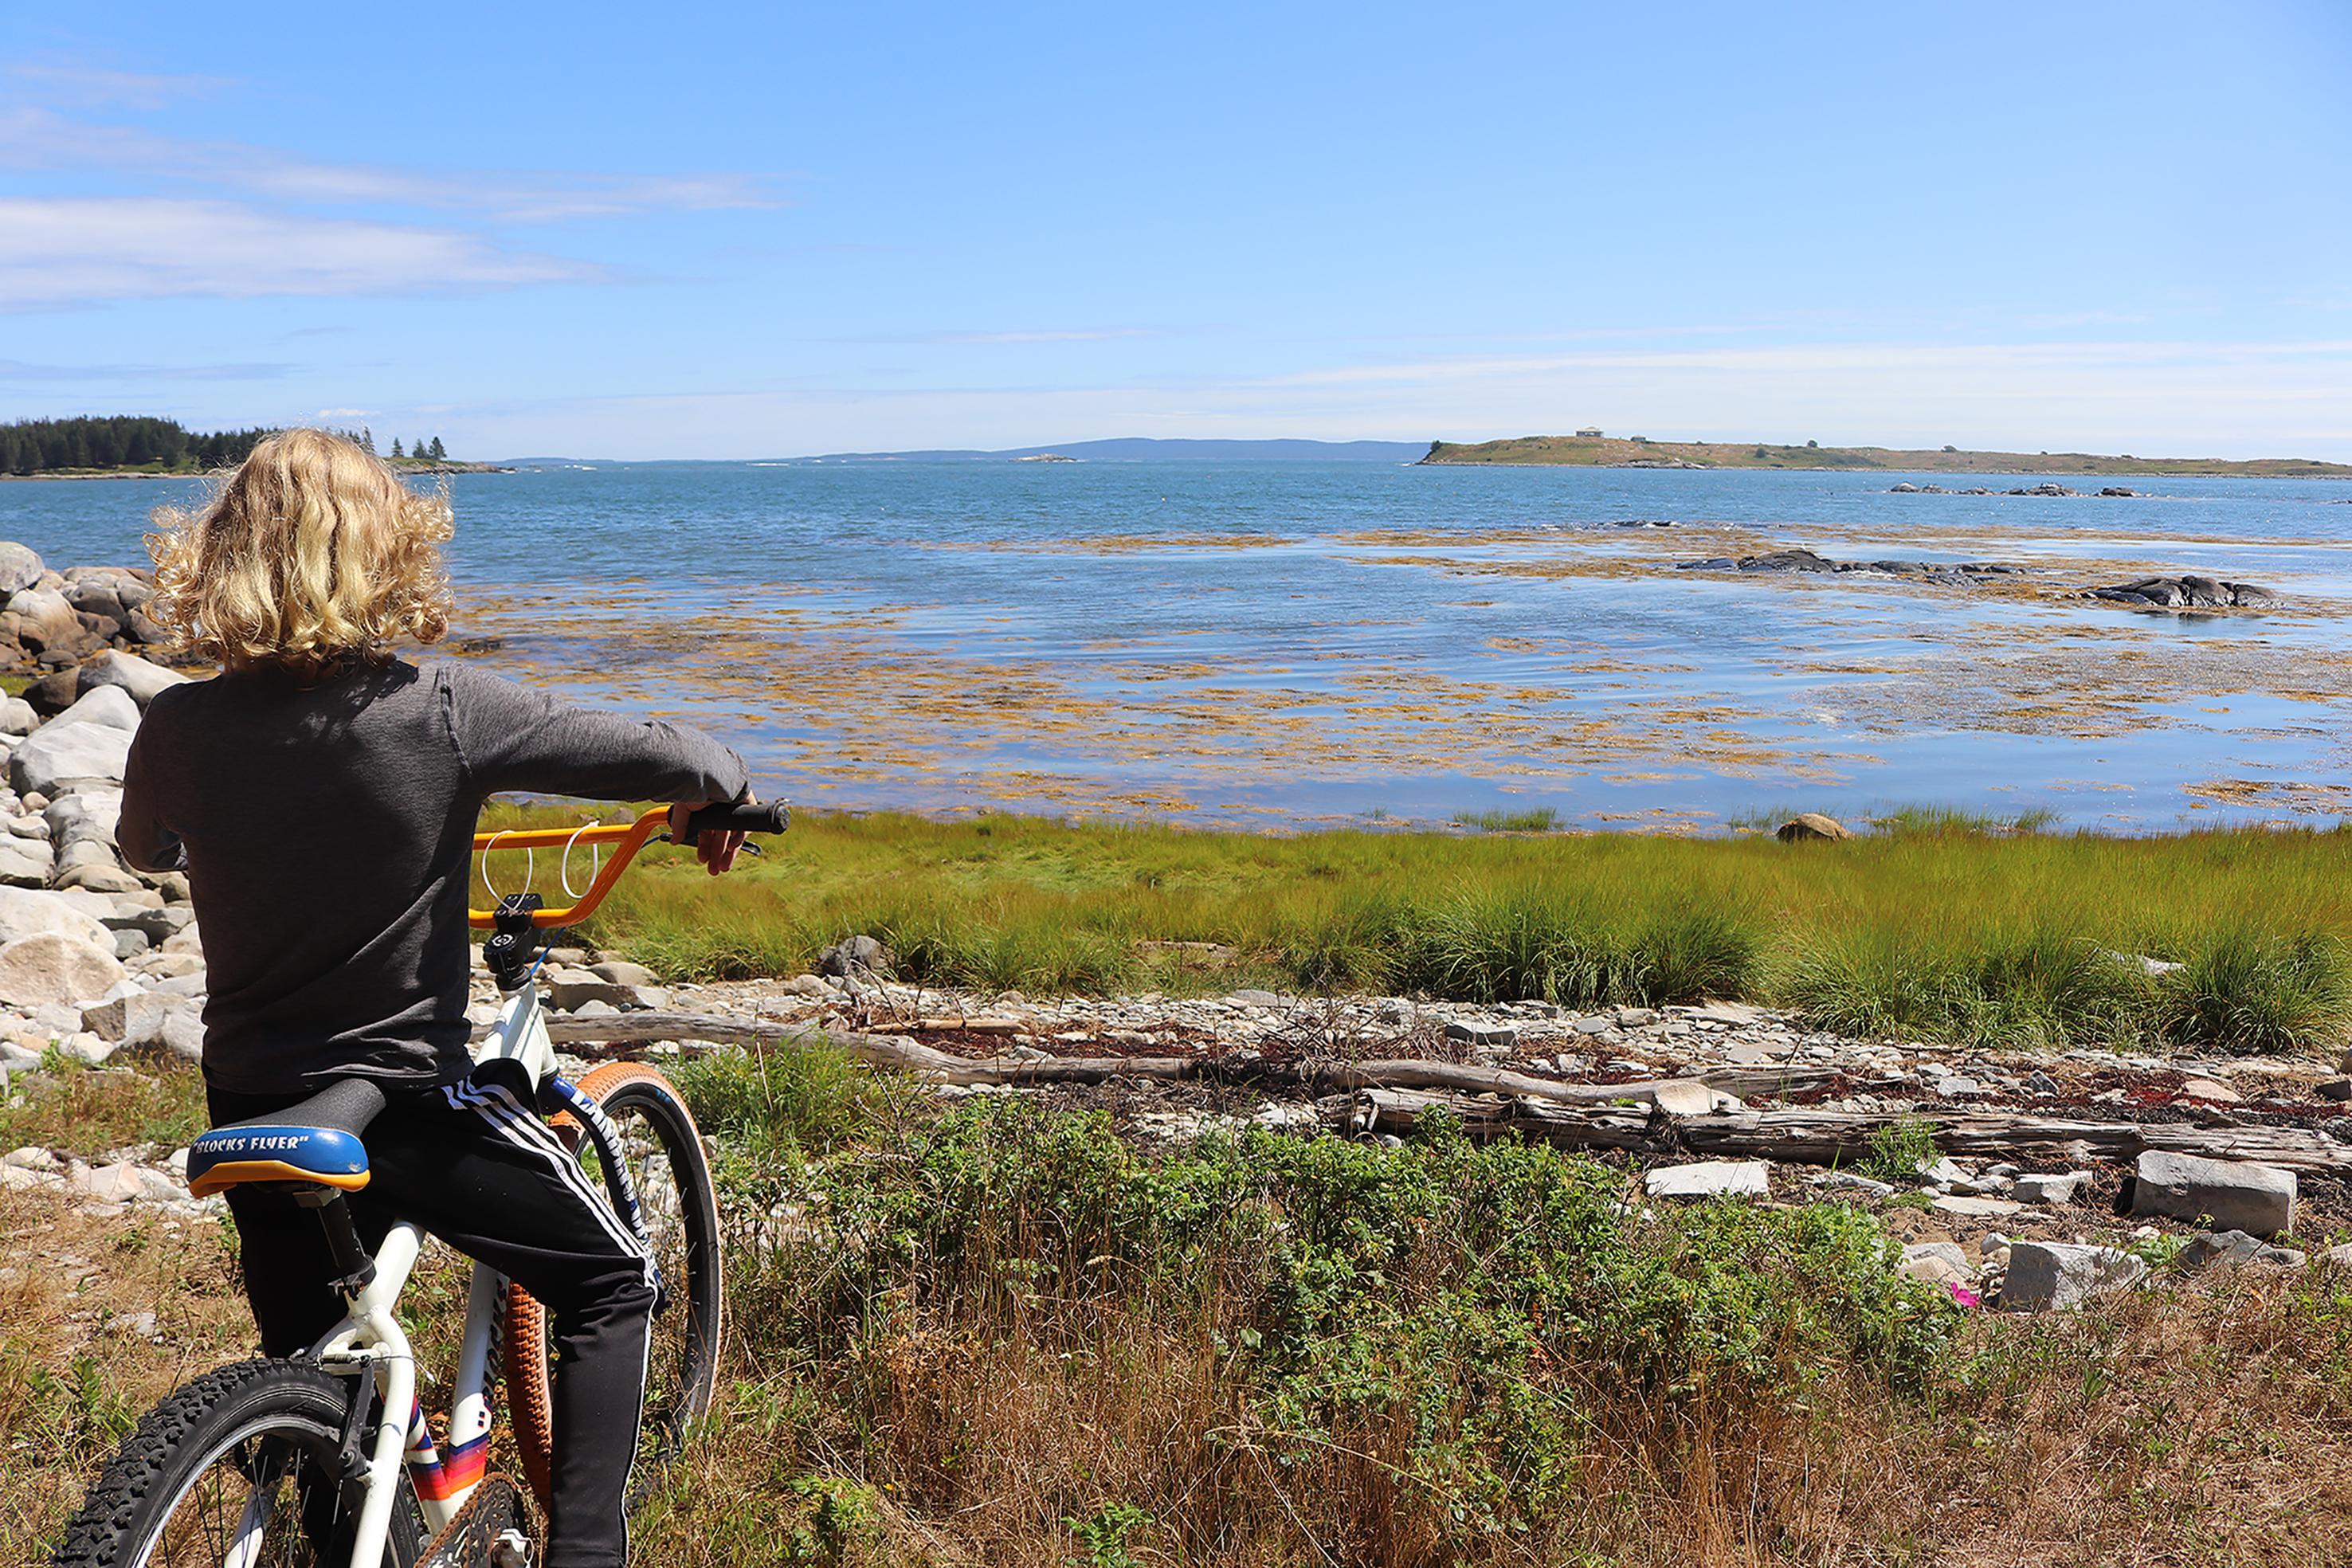 Bike view